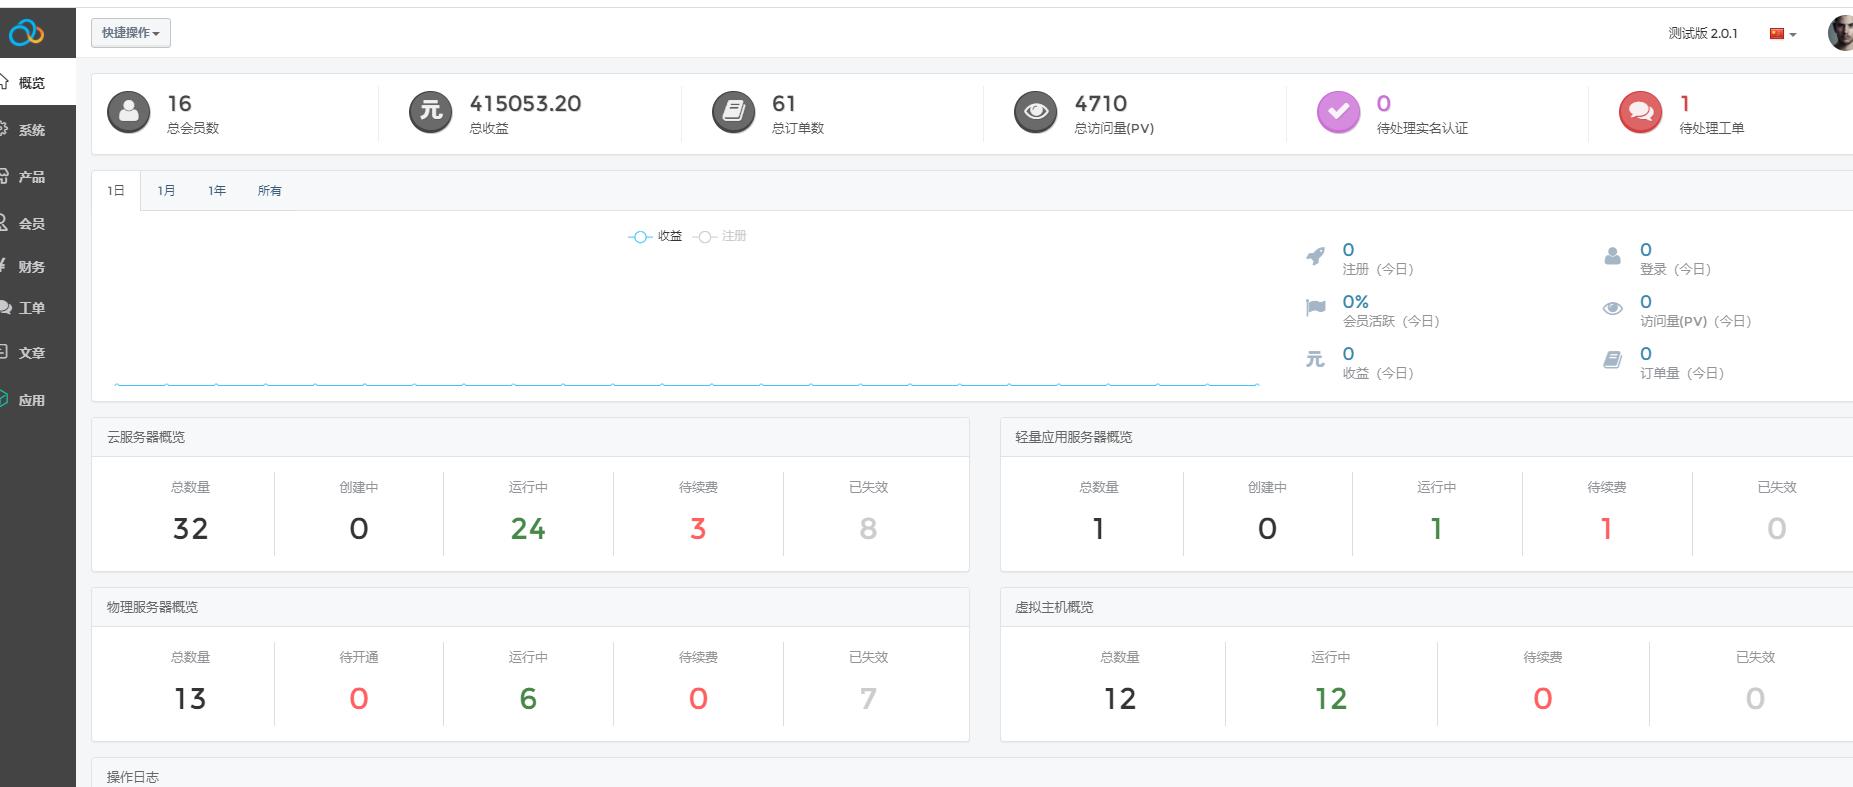 Prokvm云服务器管理系统2.0.0